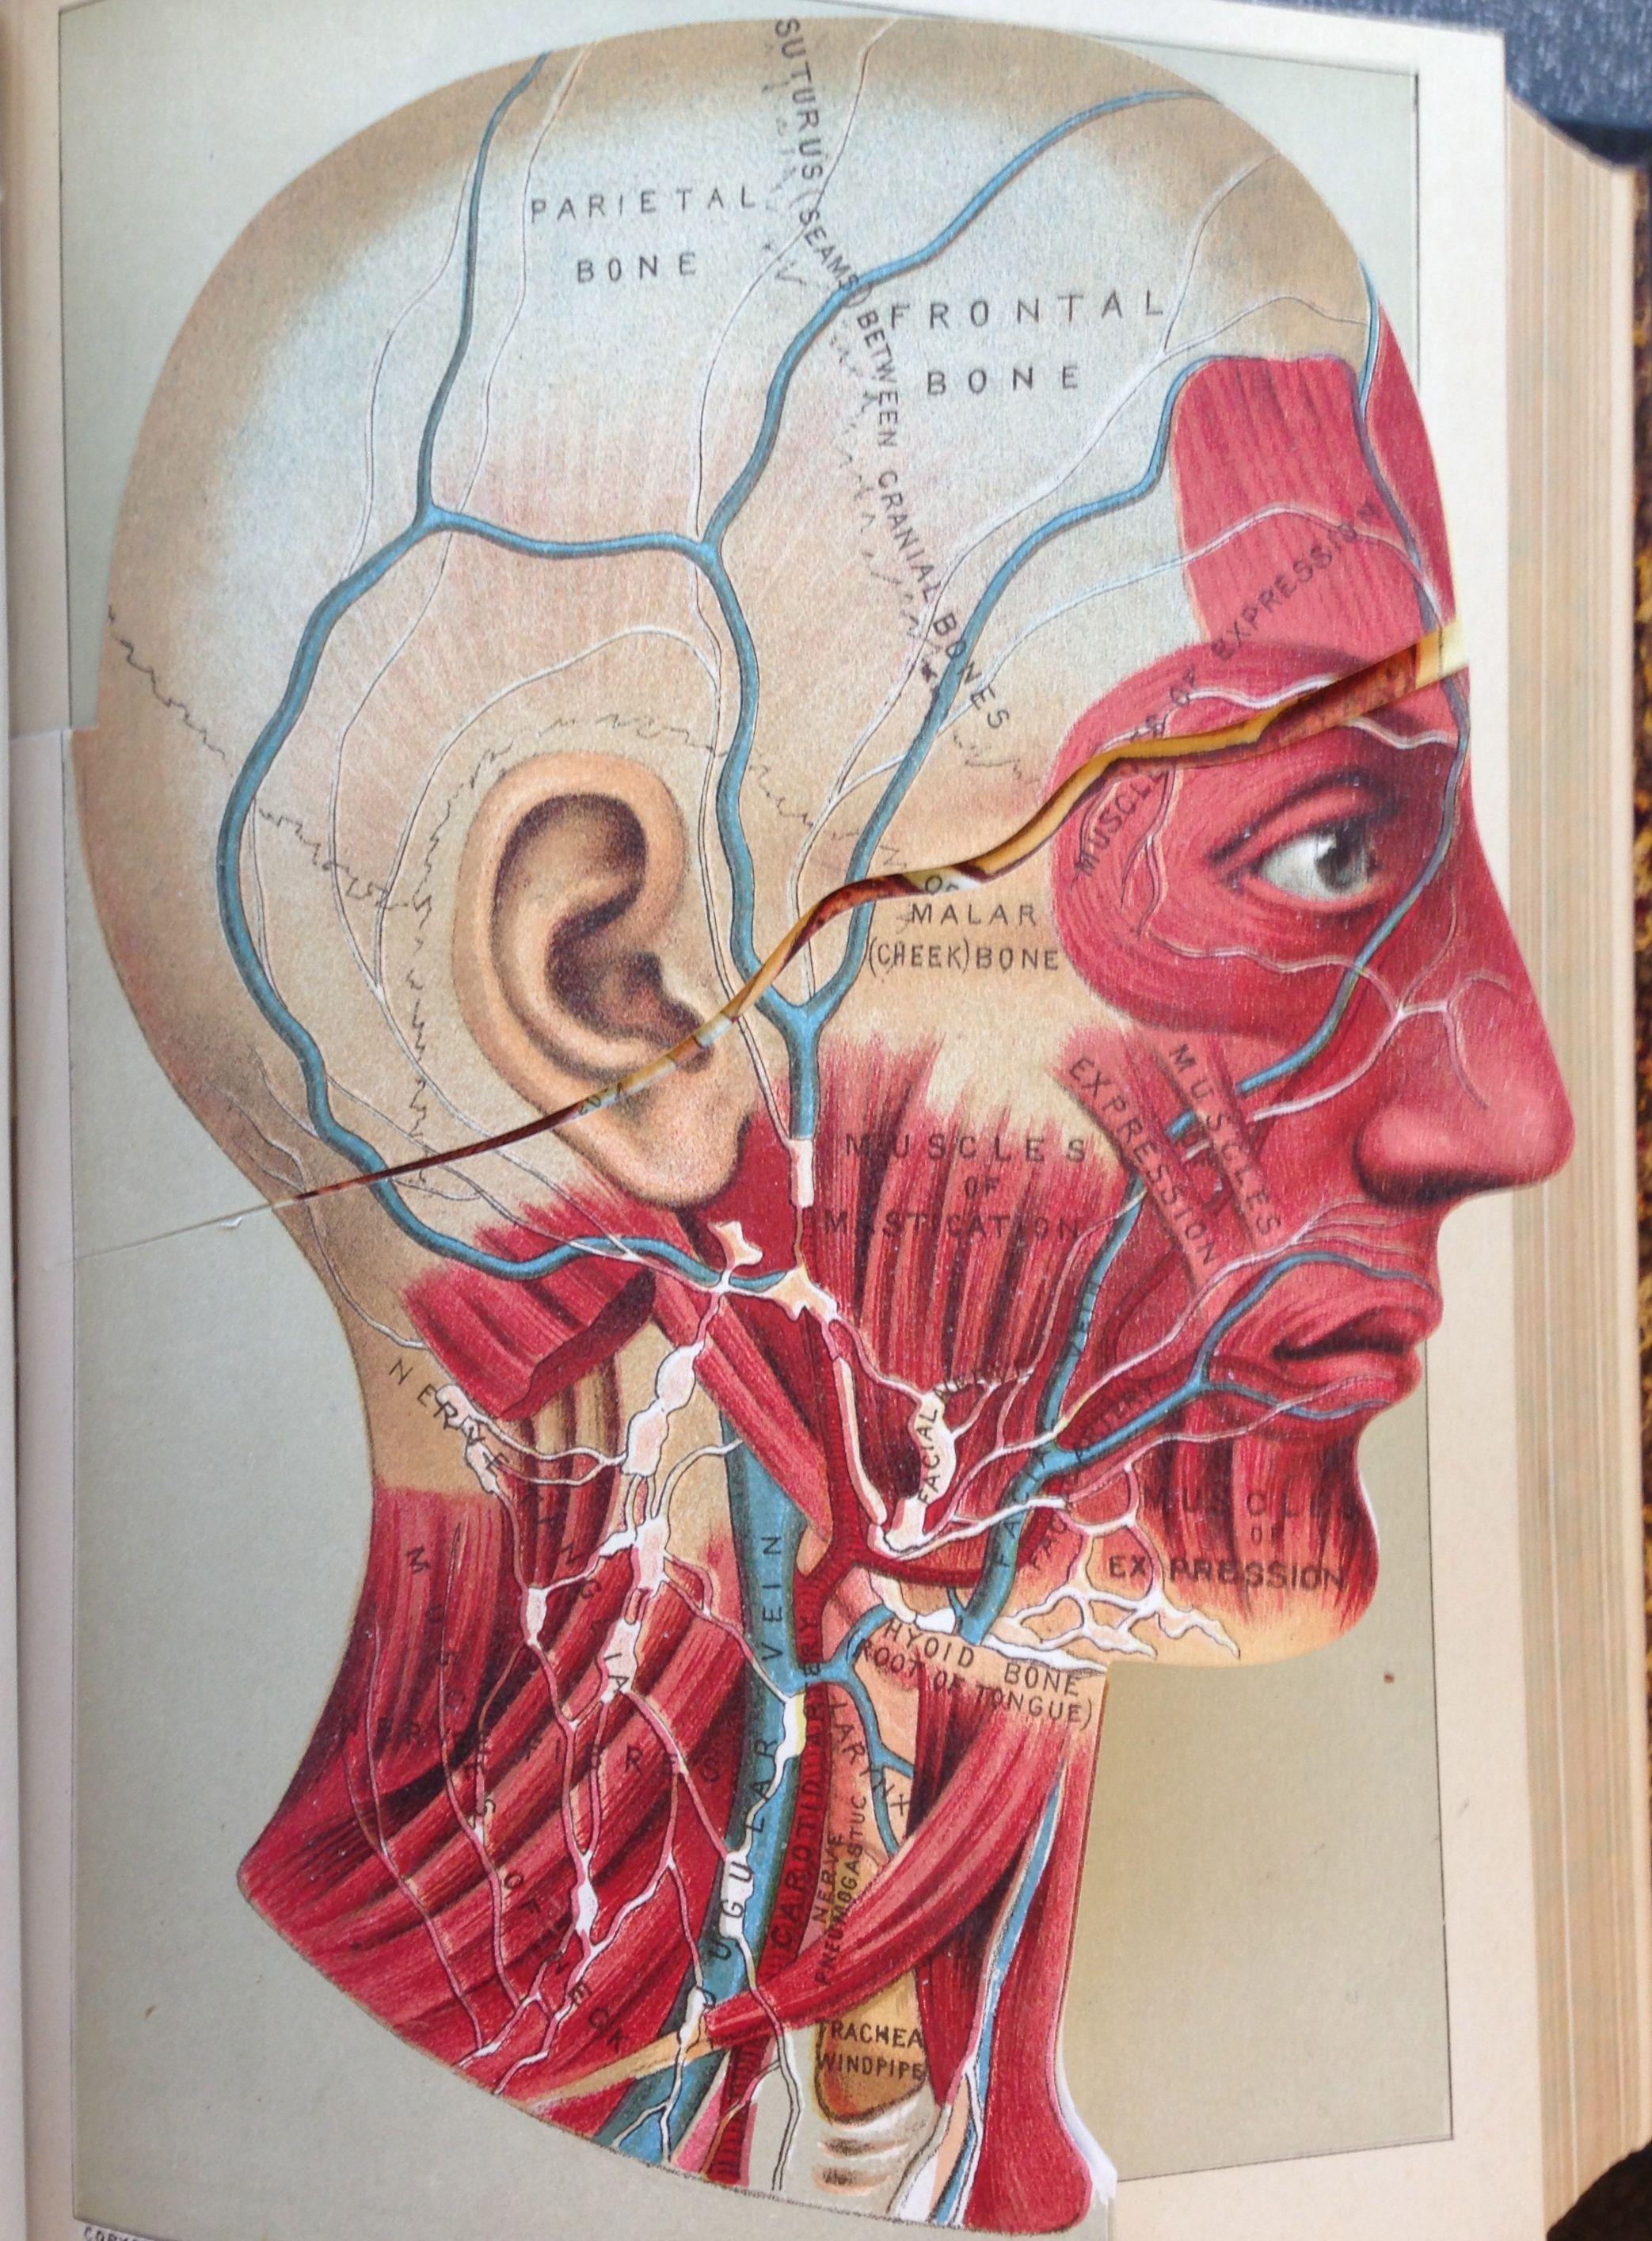 Chromolithographed anatomical flaps, circa 1885